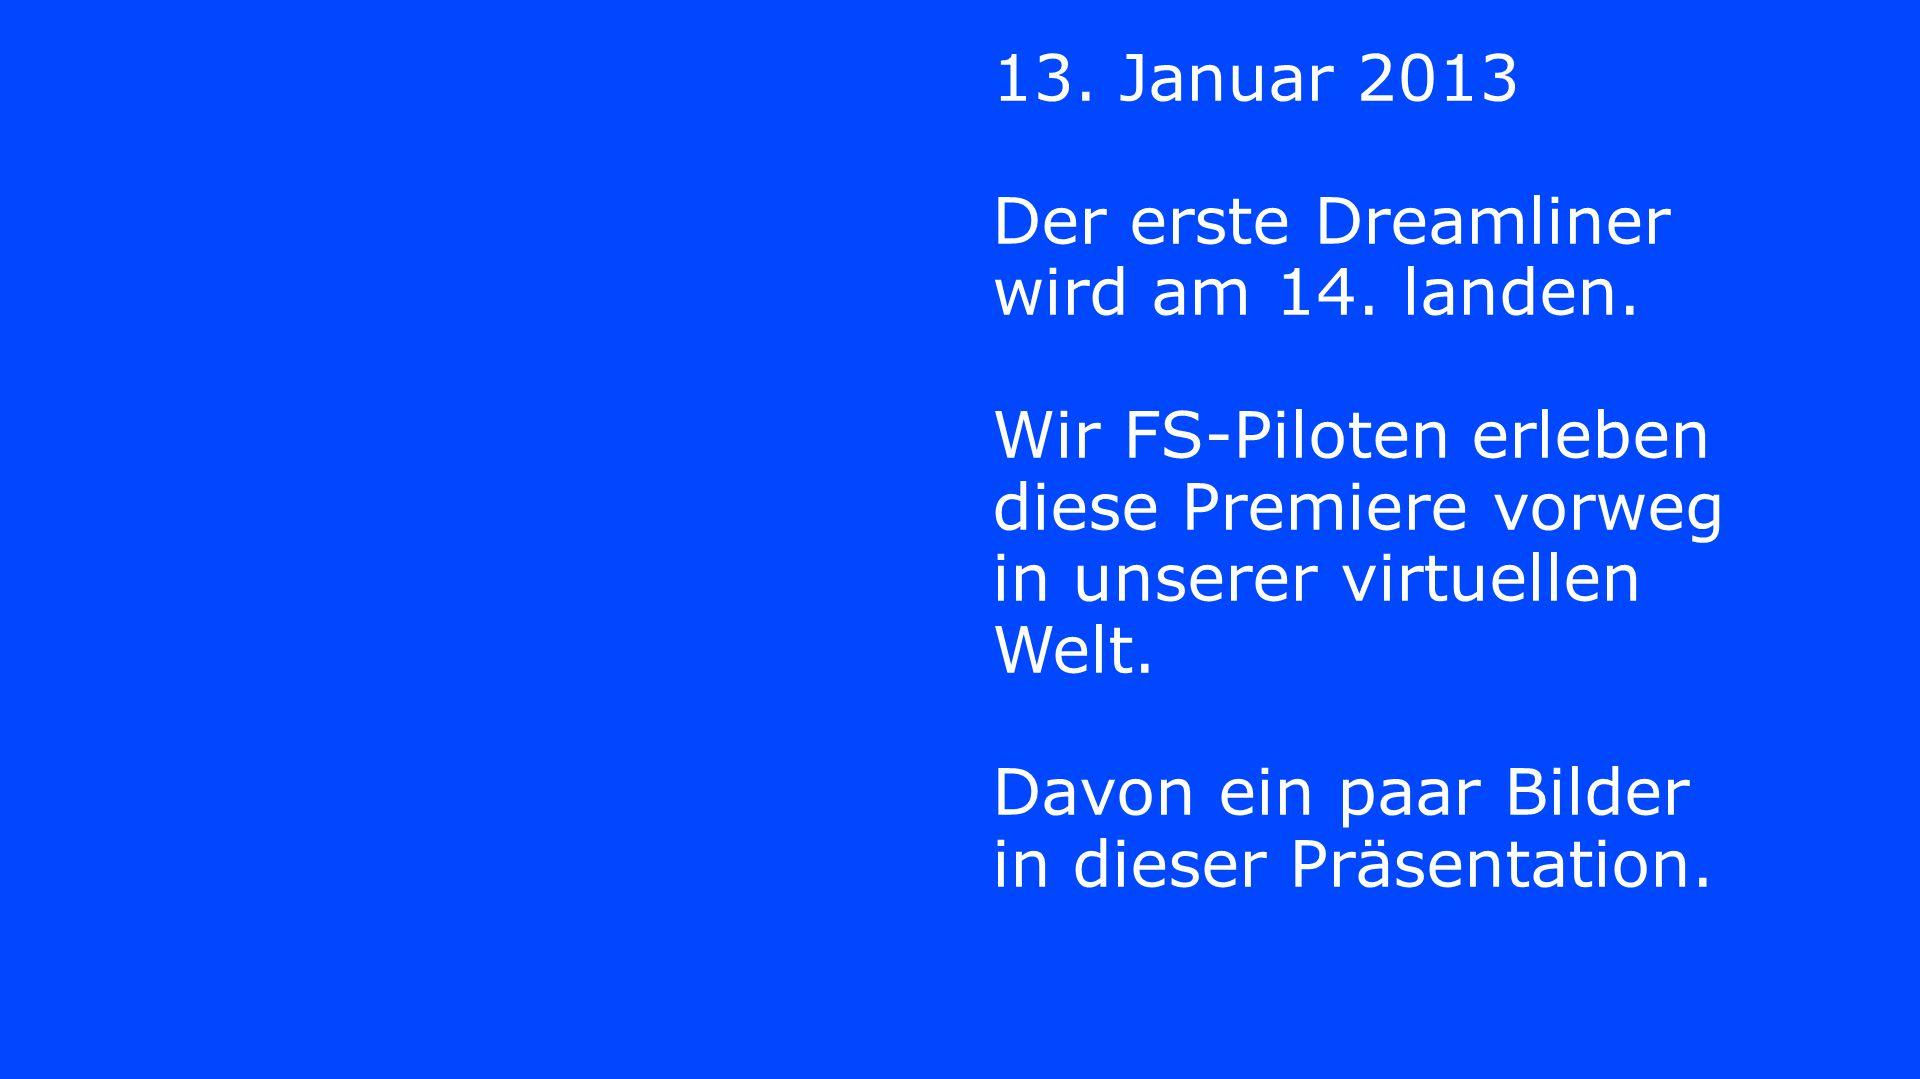 13. Januar 2013 Der erste Dreamliner wird am 14. landen.